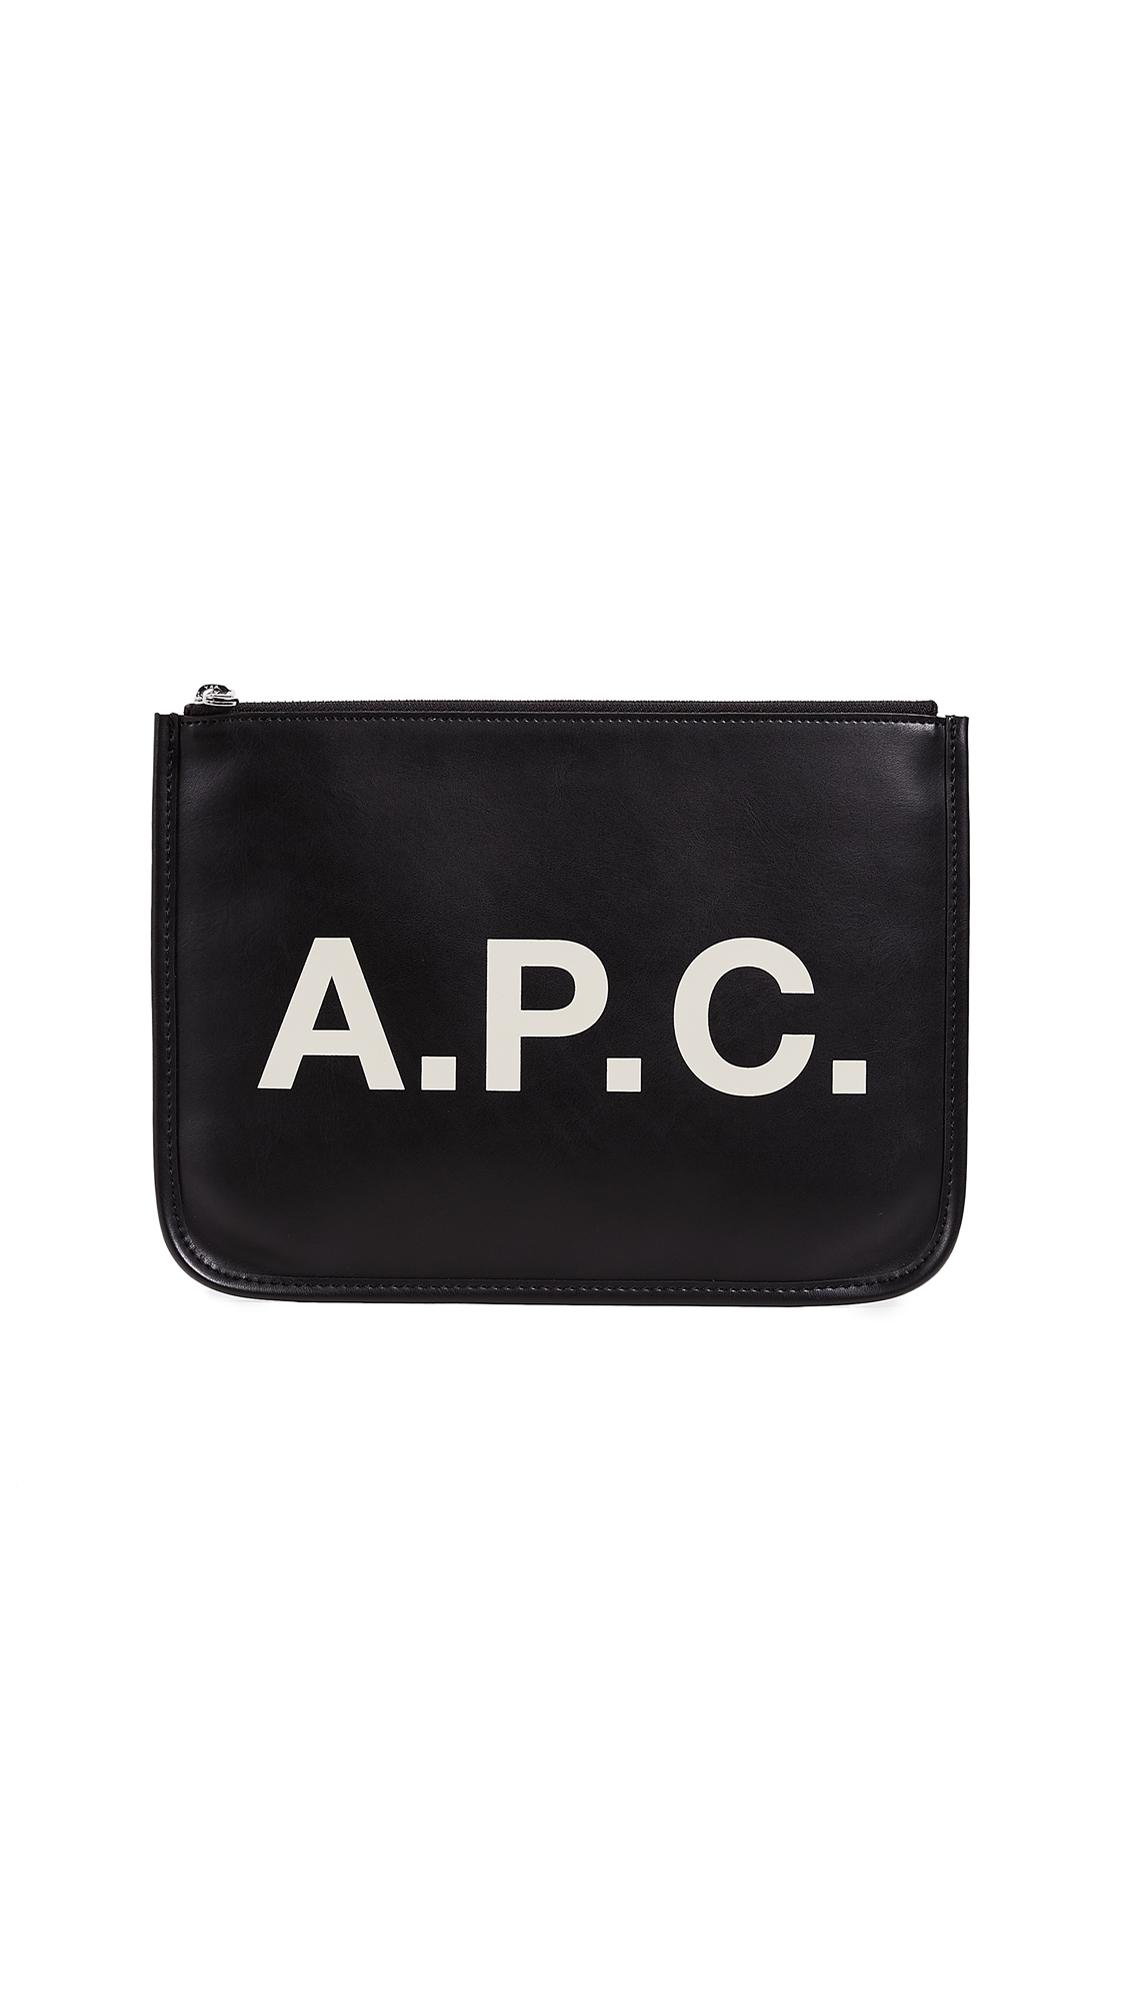 A.p.c. Pouches Morgan Pouch